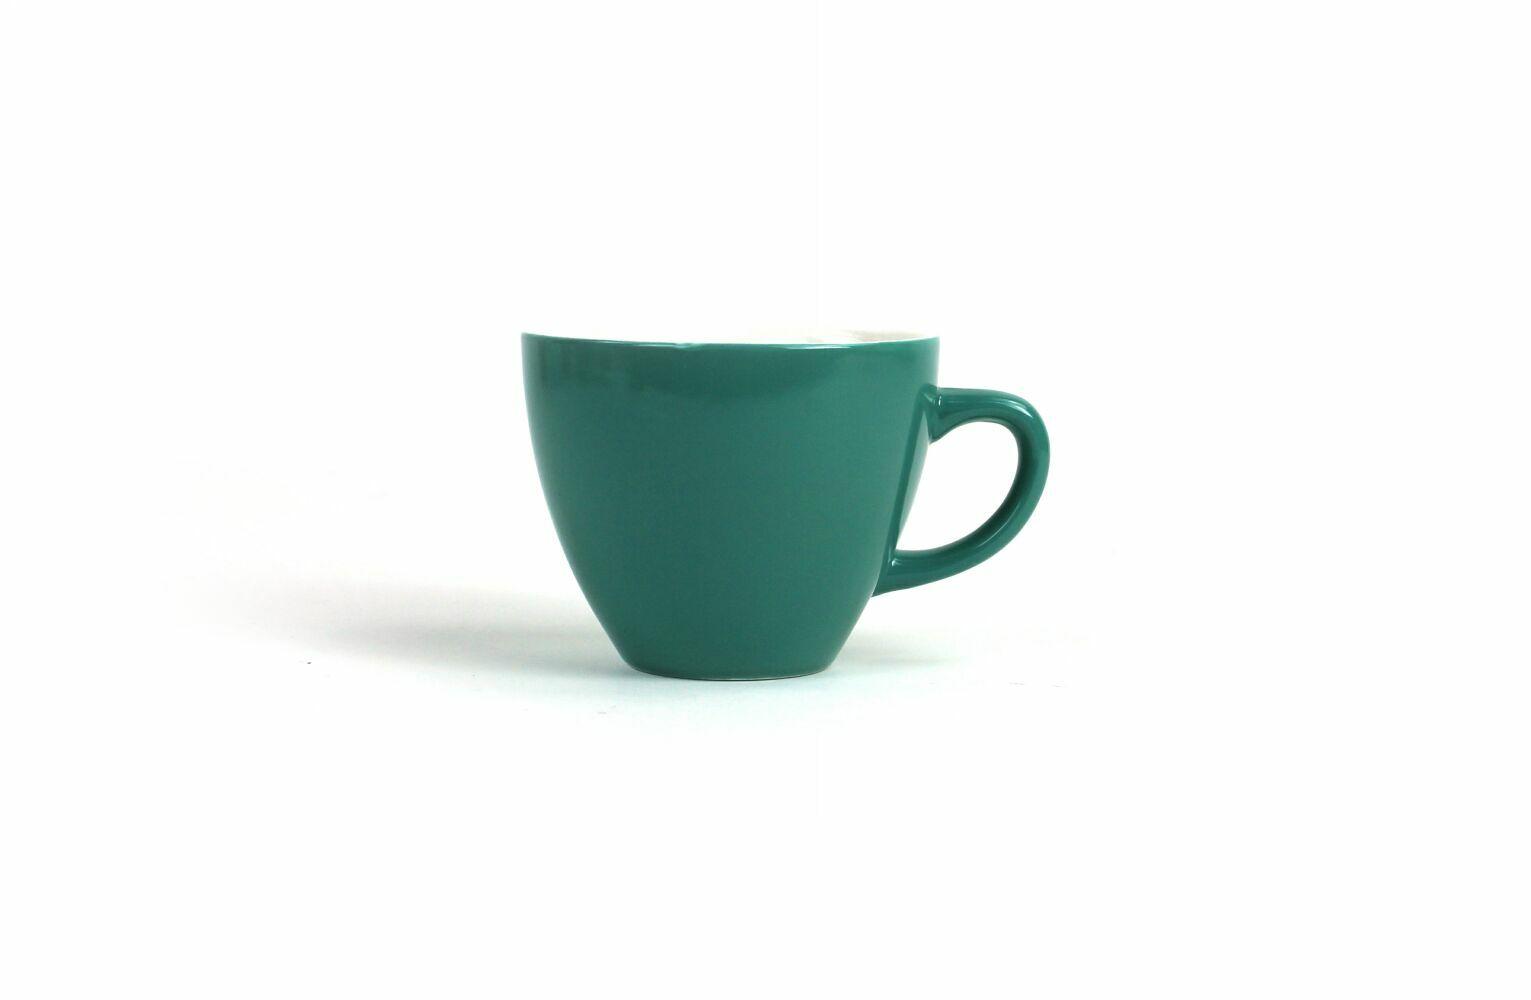 Пинкл (Pinkl) | Кружка с кактусом 330мл | Creature Cups Cactus